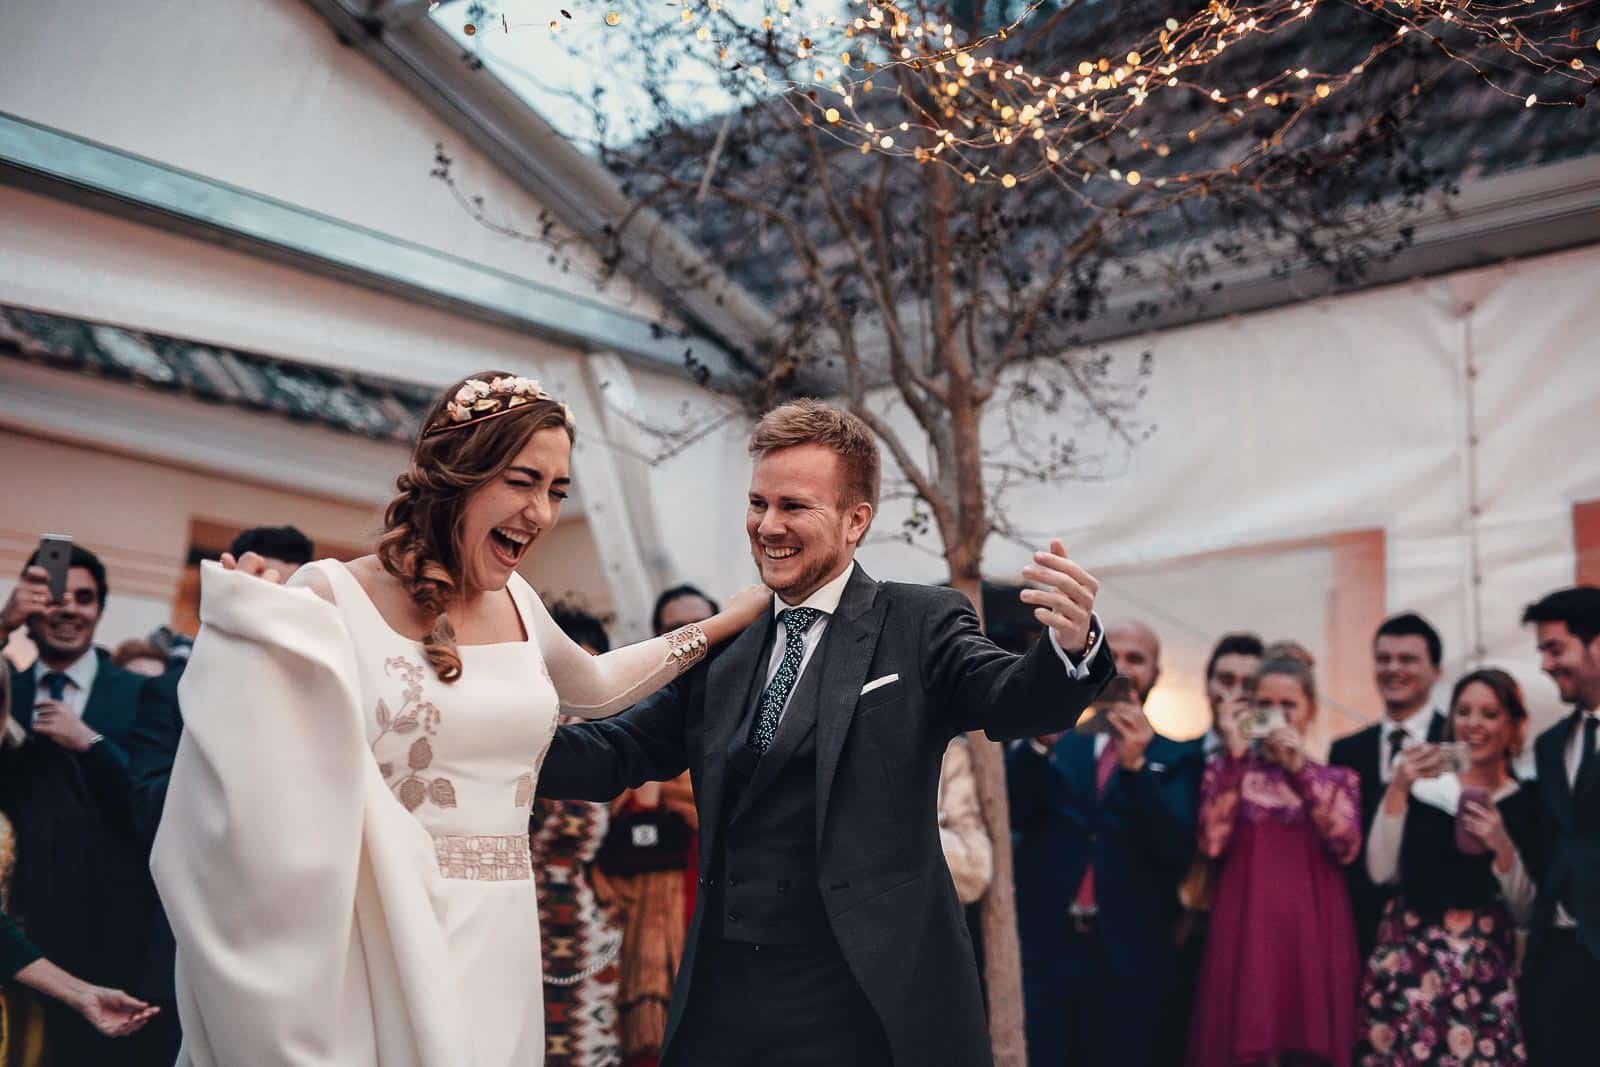 baile nupcial boda novios pareja